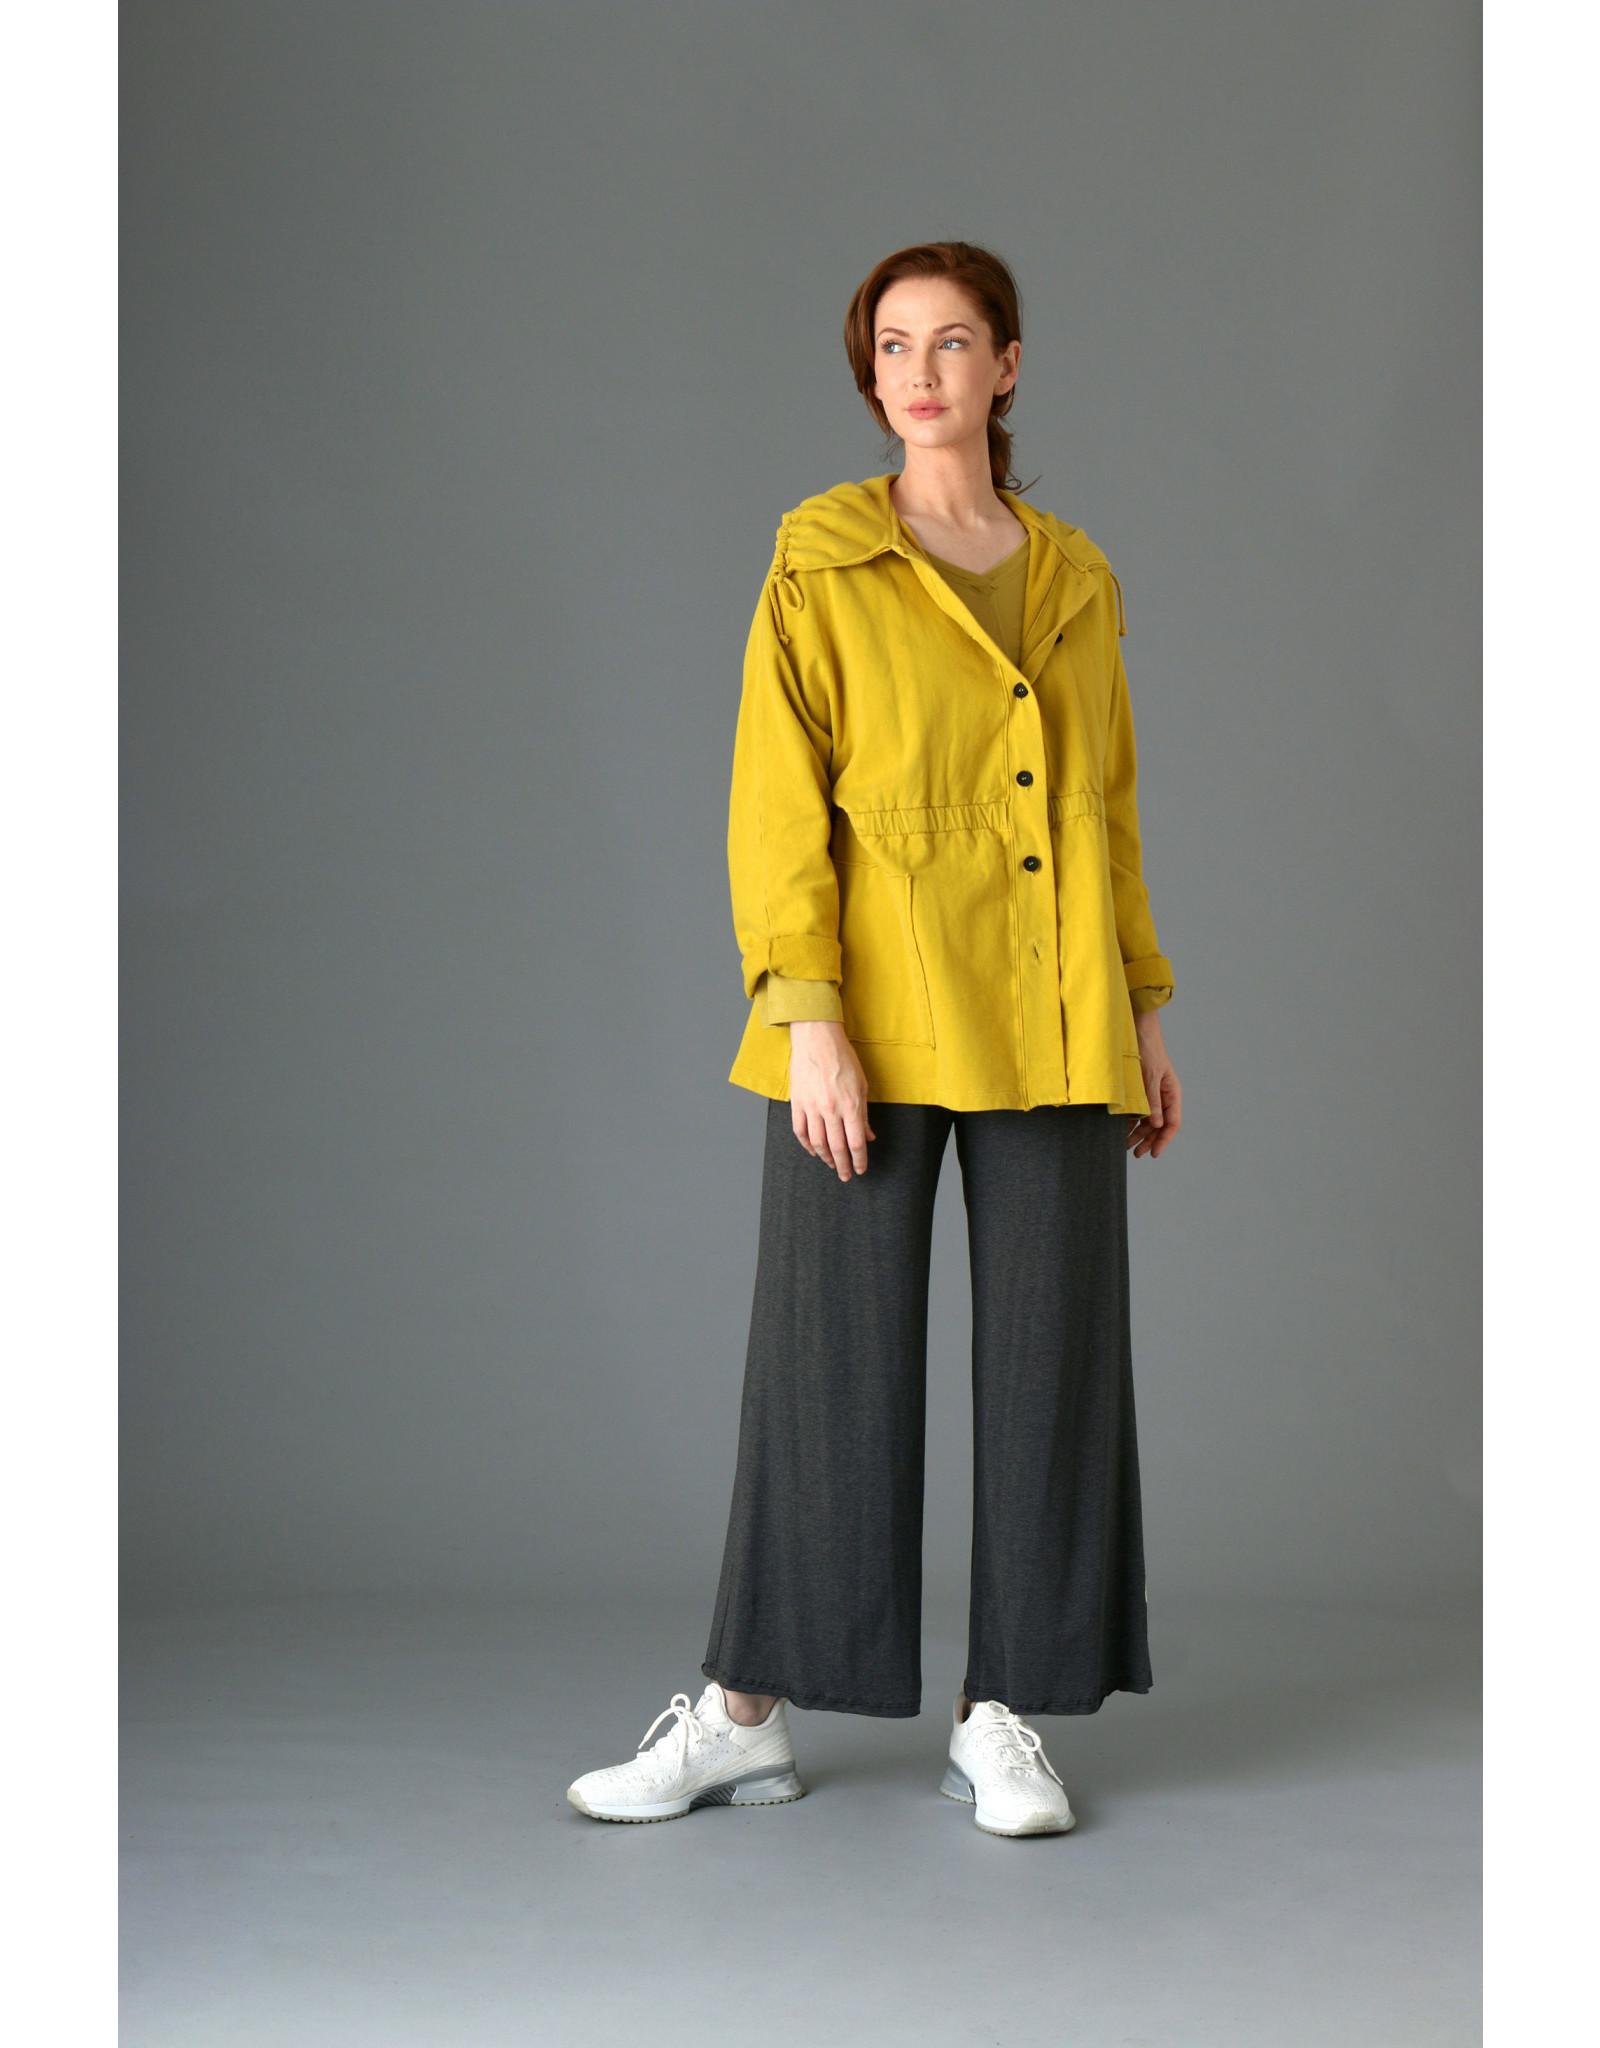 Fenini Tie Collar Jacket